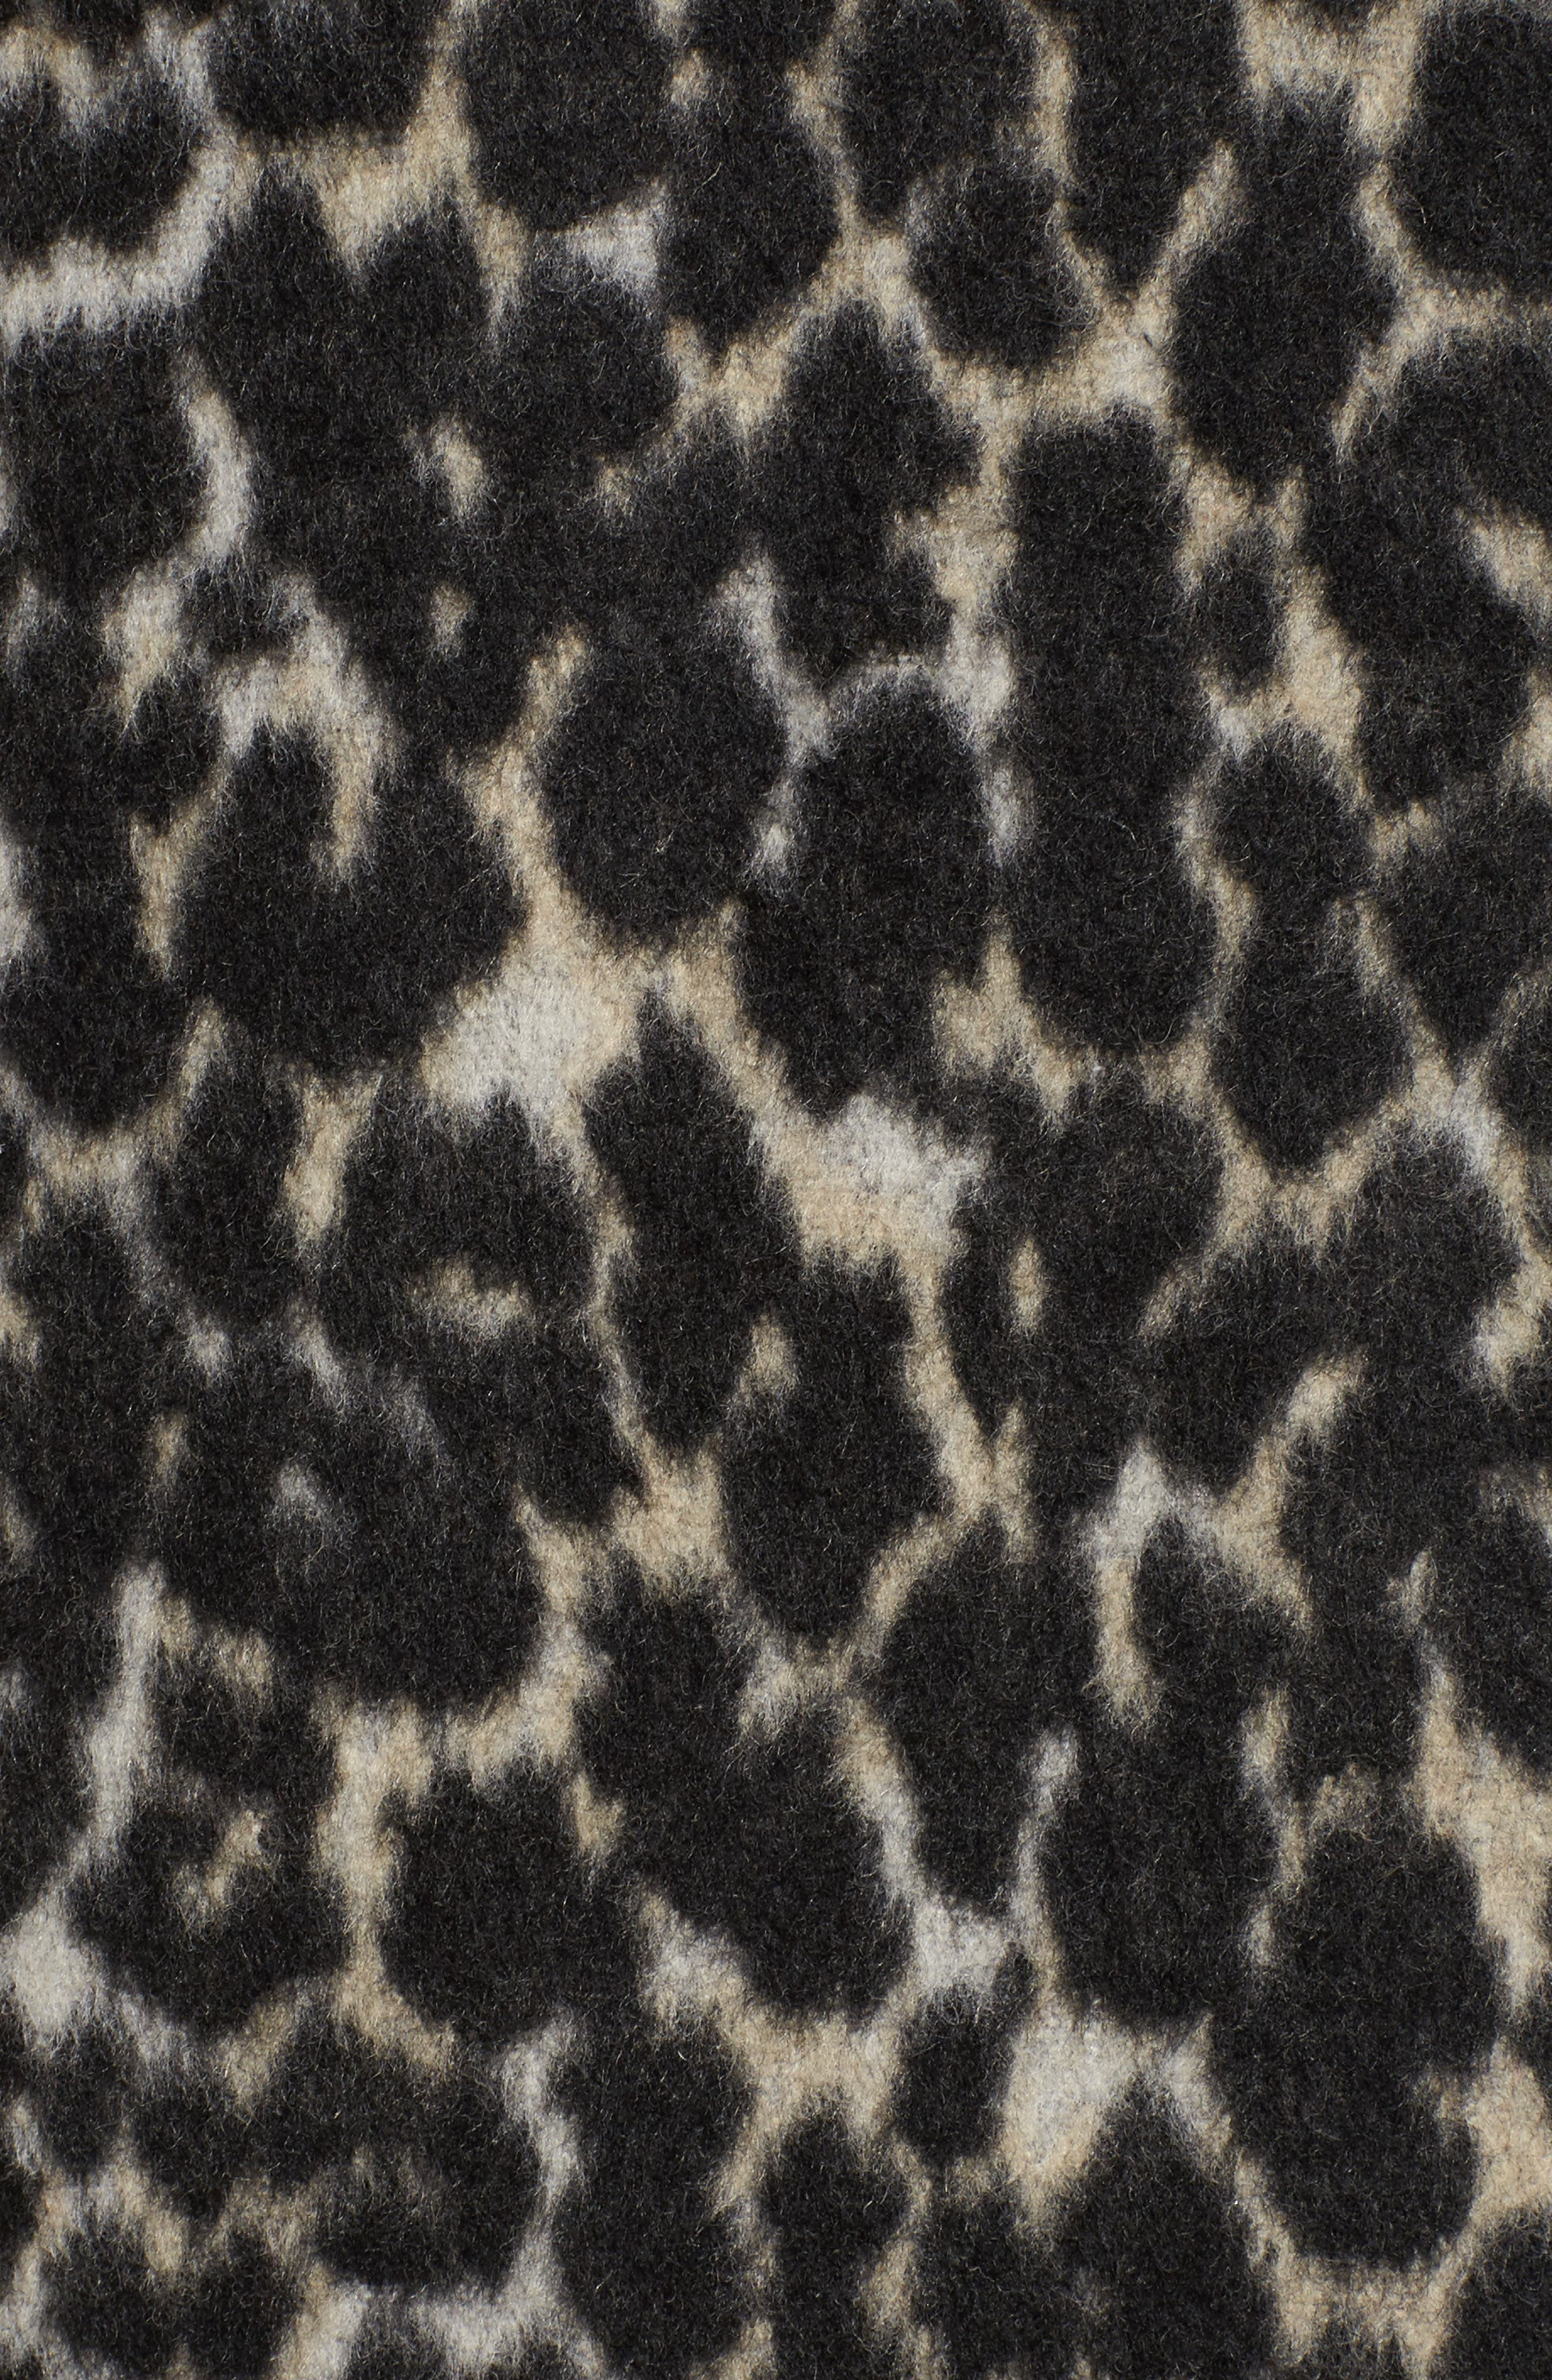 Leopard Print Longline Bomber Jacket,                             Alternate thumbnail 5, color,                             Cream Leopard